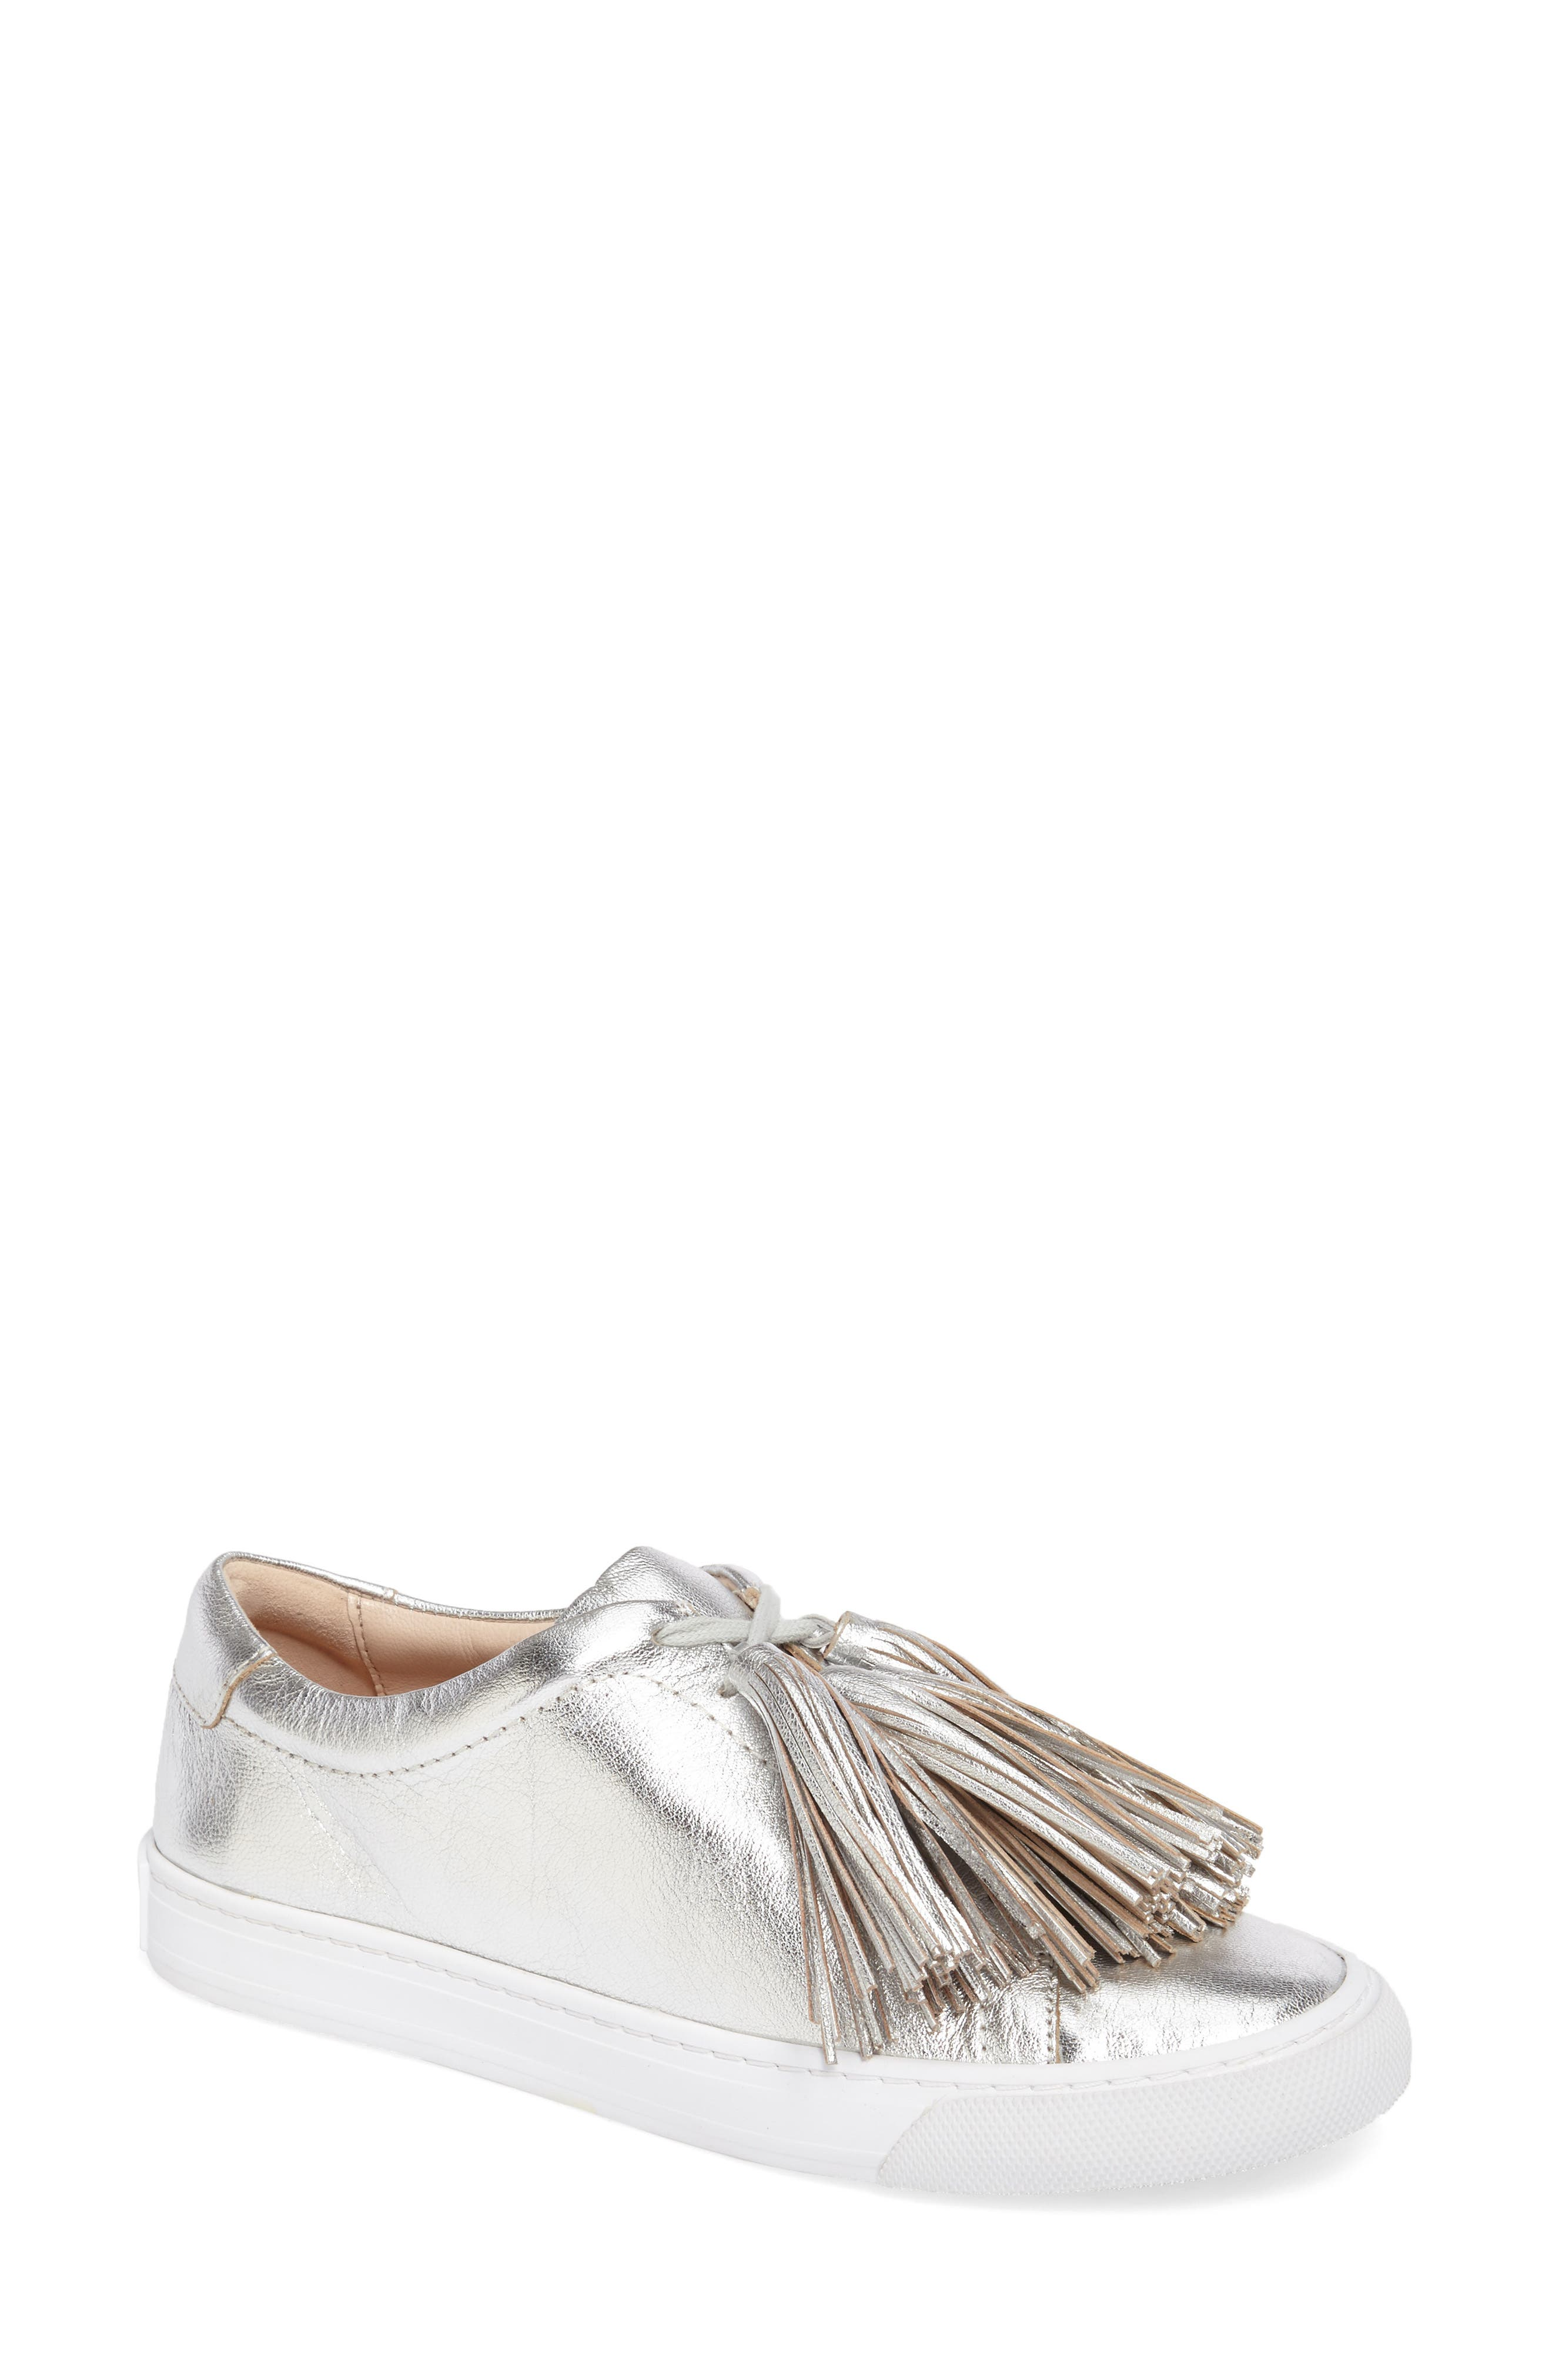 Main Image - Loeffler Randall Logan Sneaker (Women)